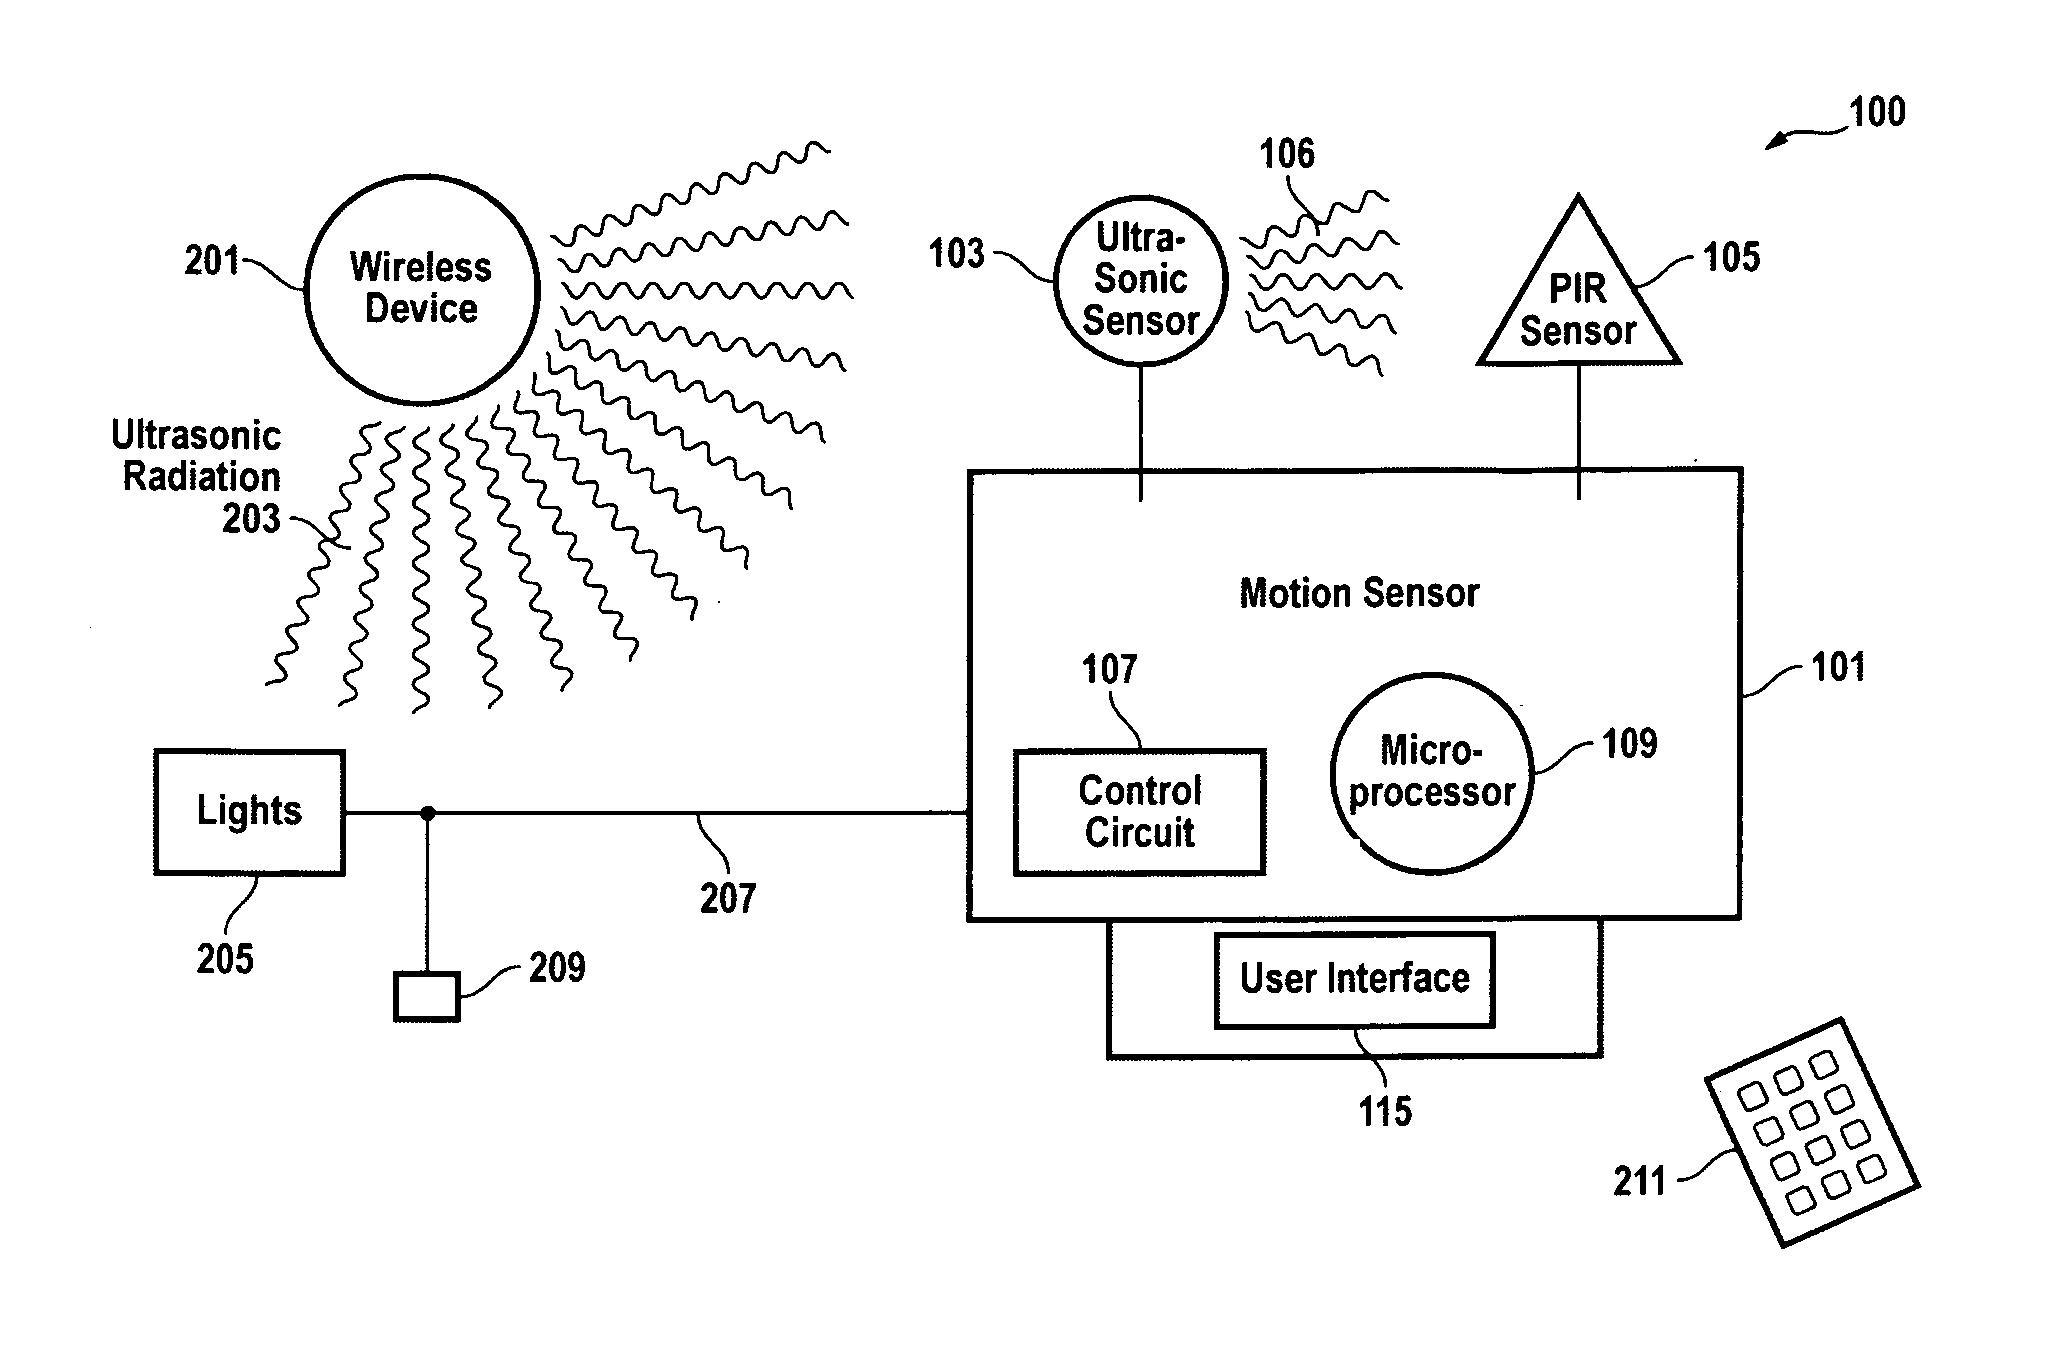 Wireless    Device Block    Diagram      Wiring    Diagram    Database